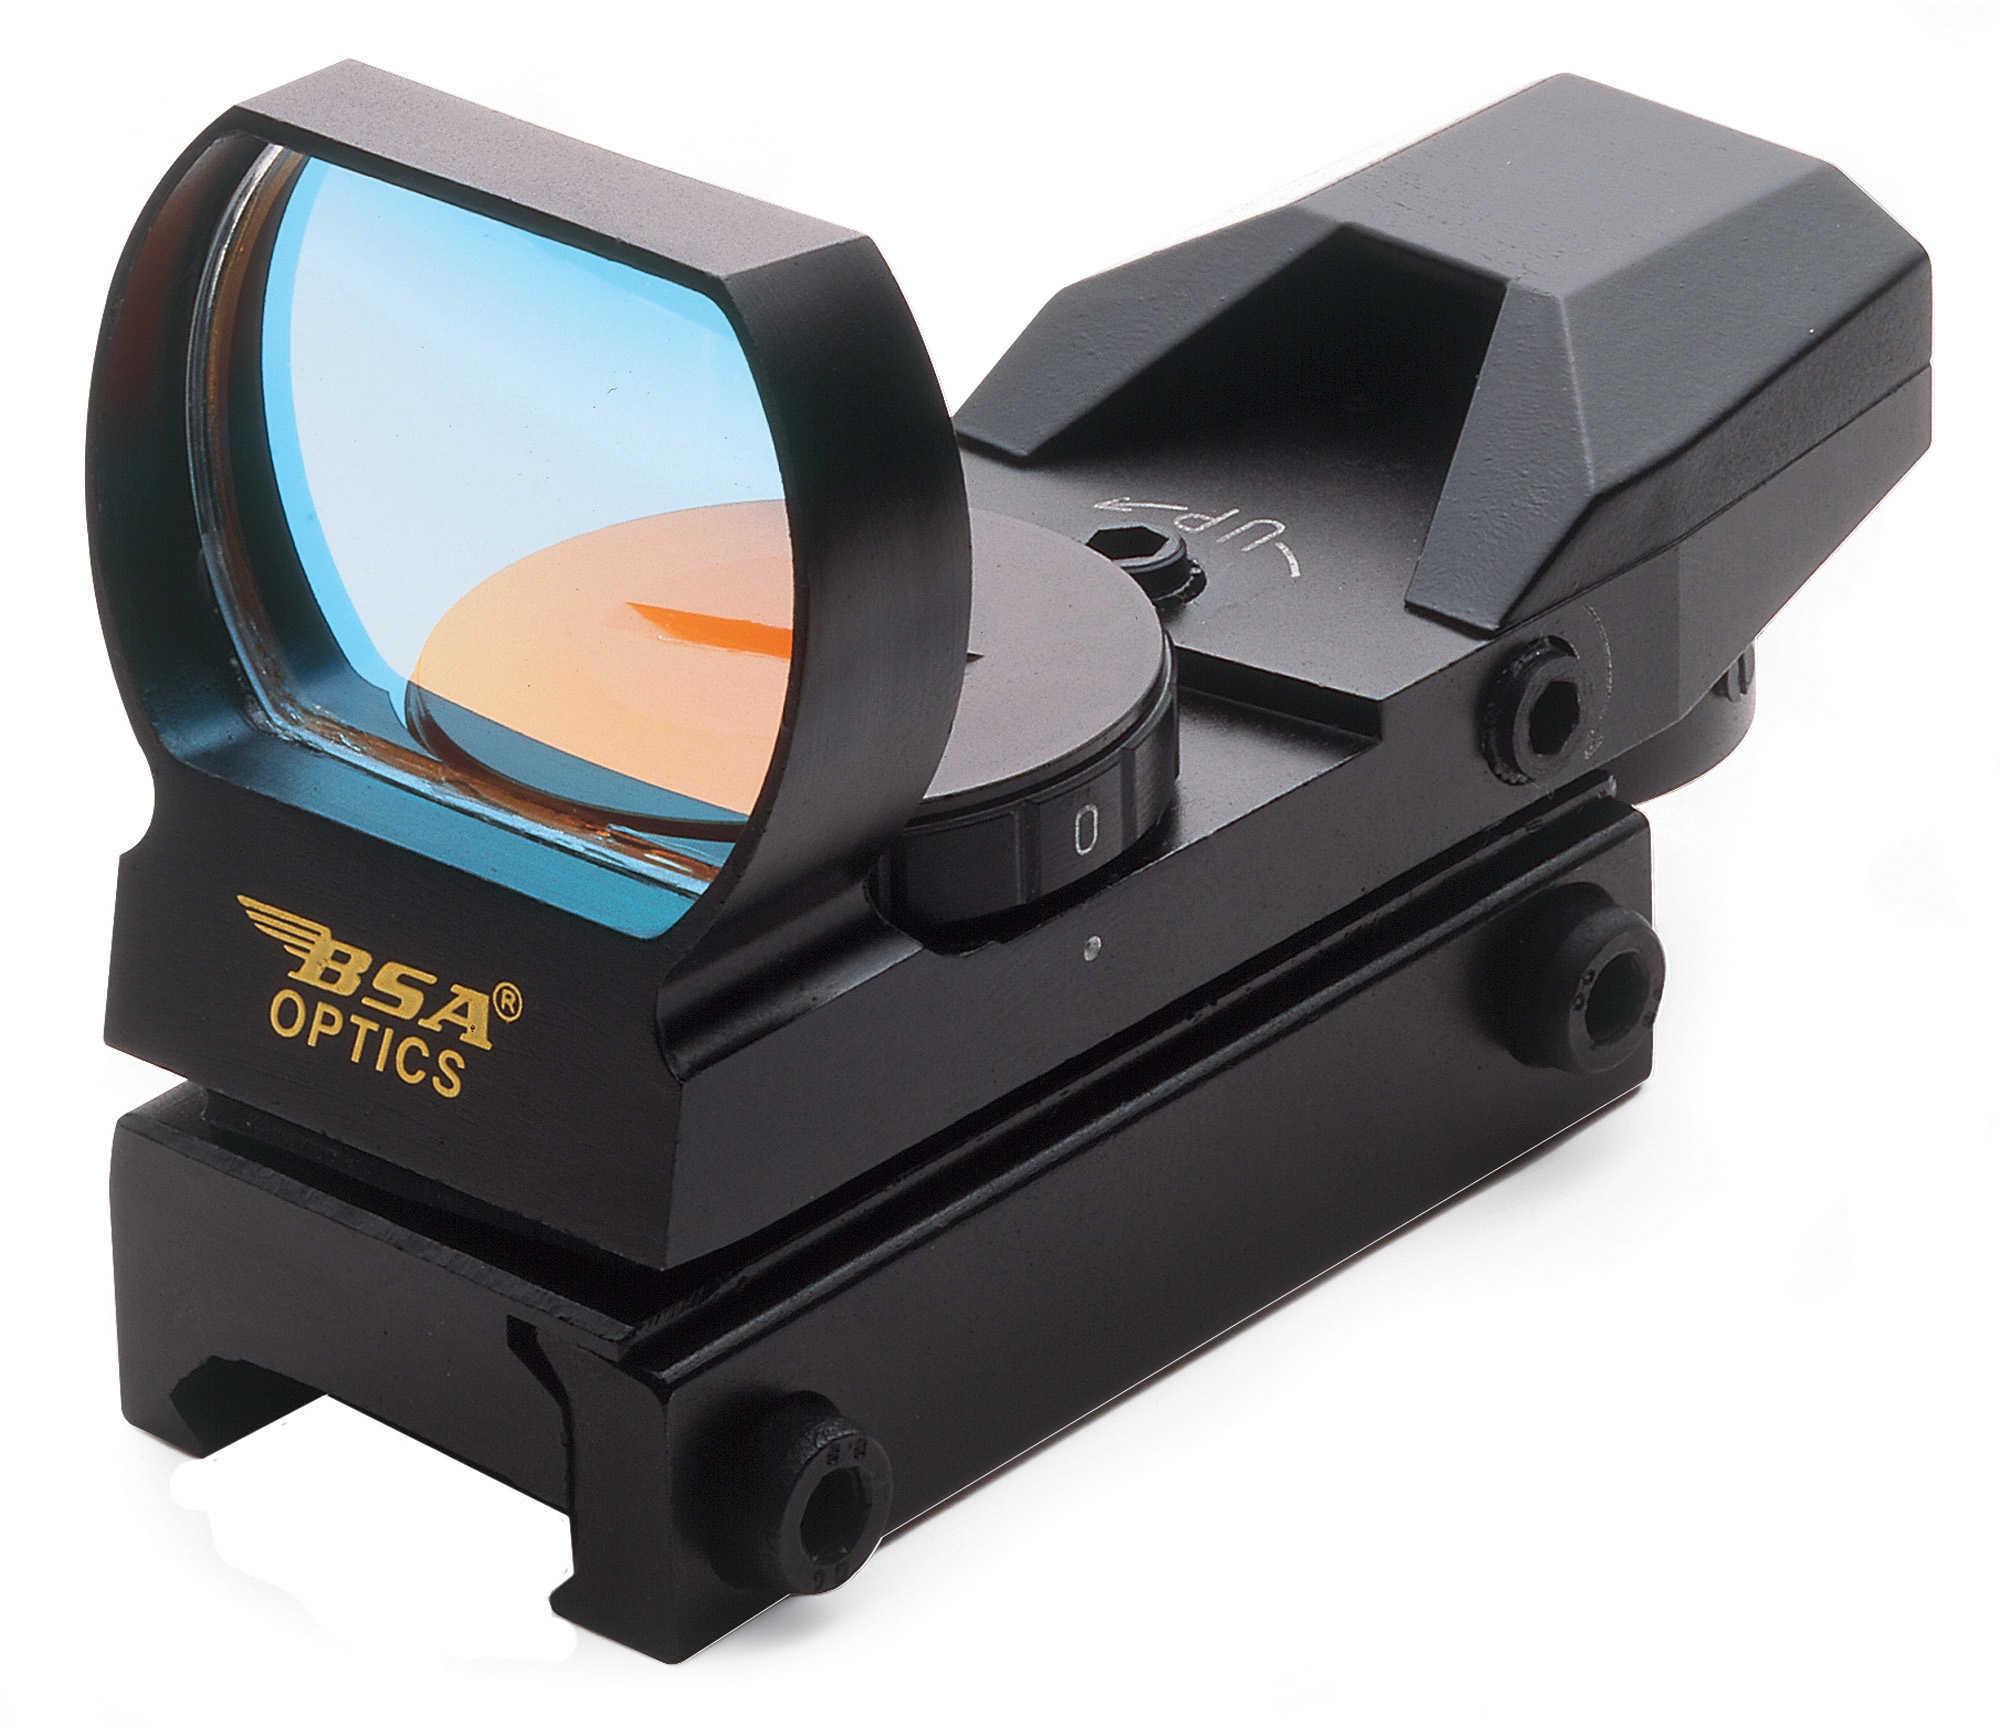 Bsa Optics Panoramic Multi-Purpose Sighting System Red Dot Black Panoramic Sight W/ Weaver Style Mnt, 7-pos Rheostat Adj